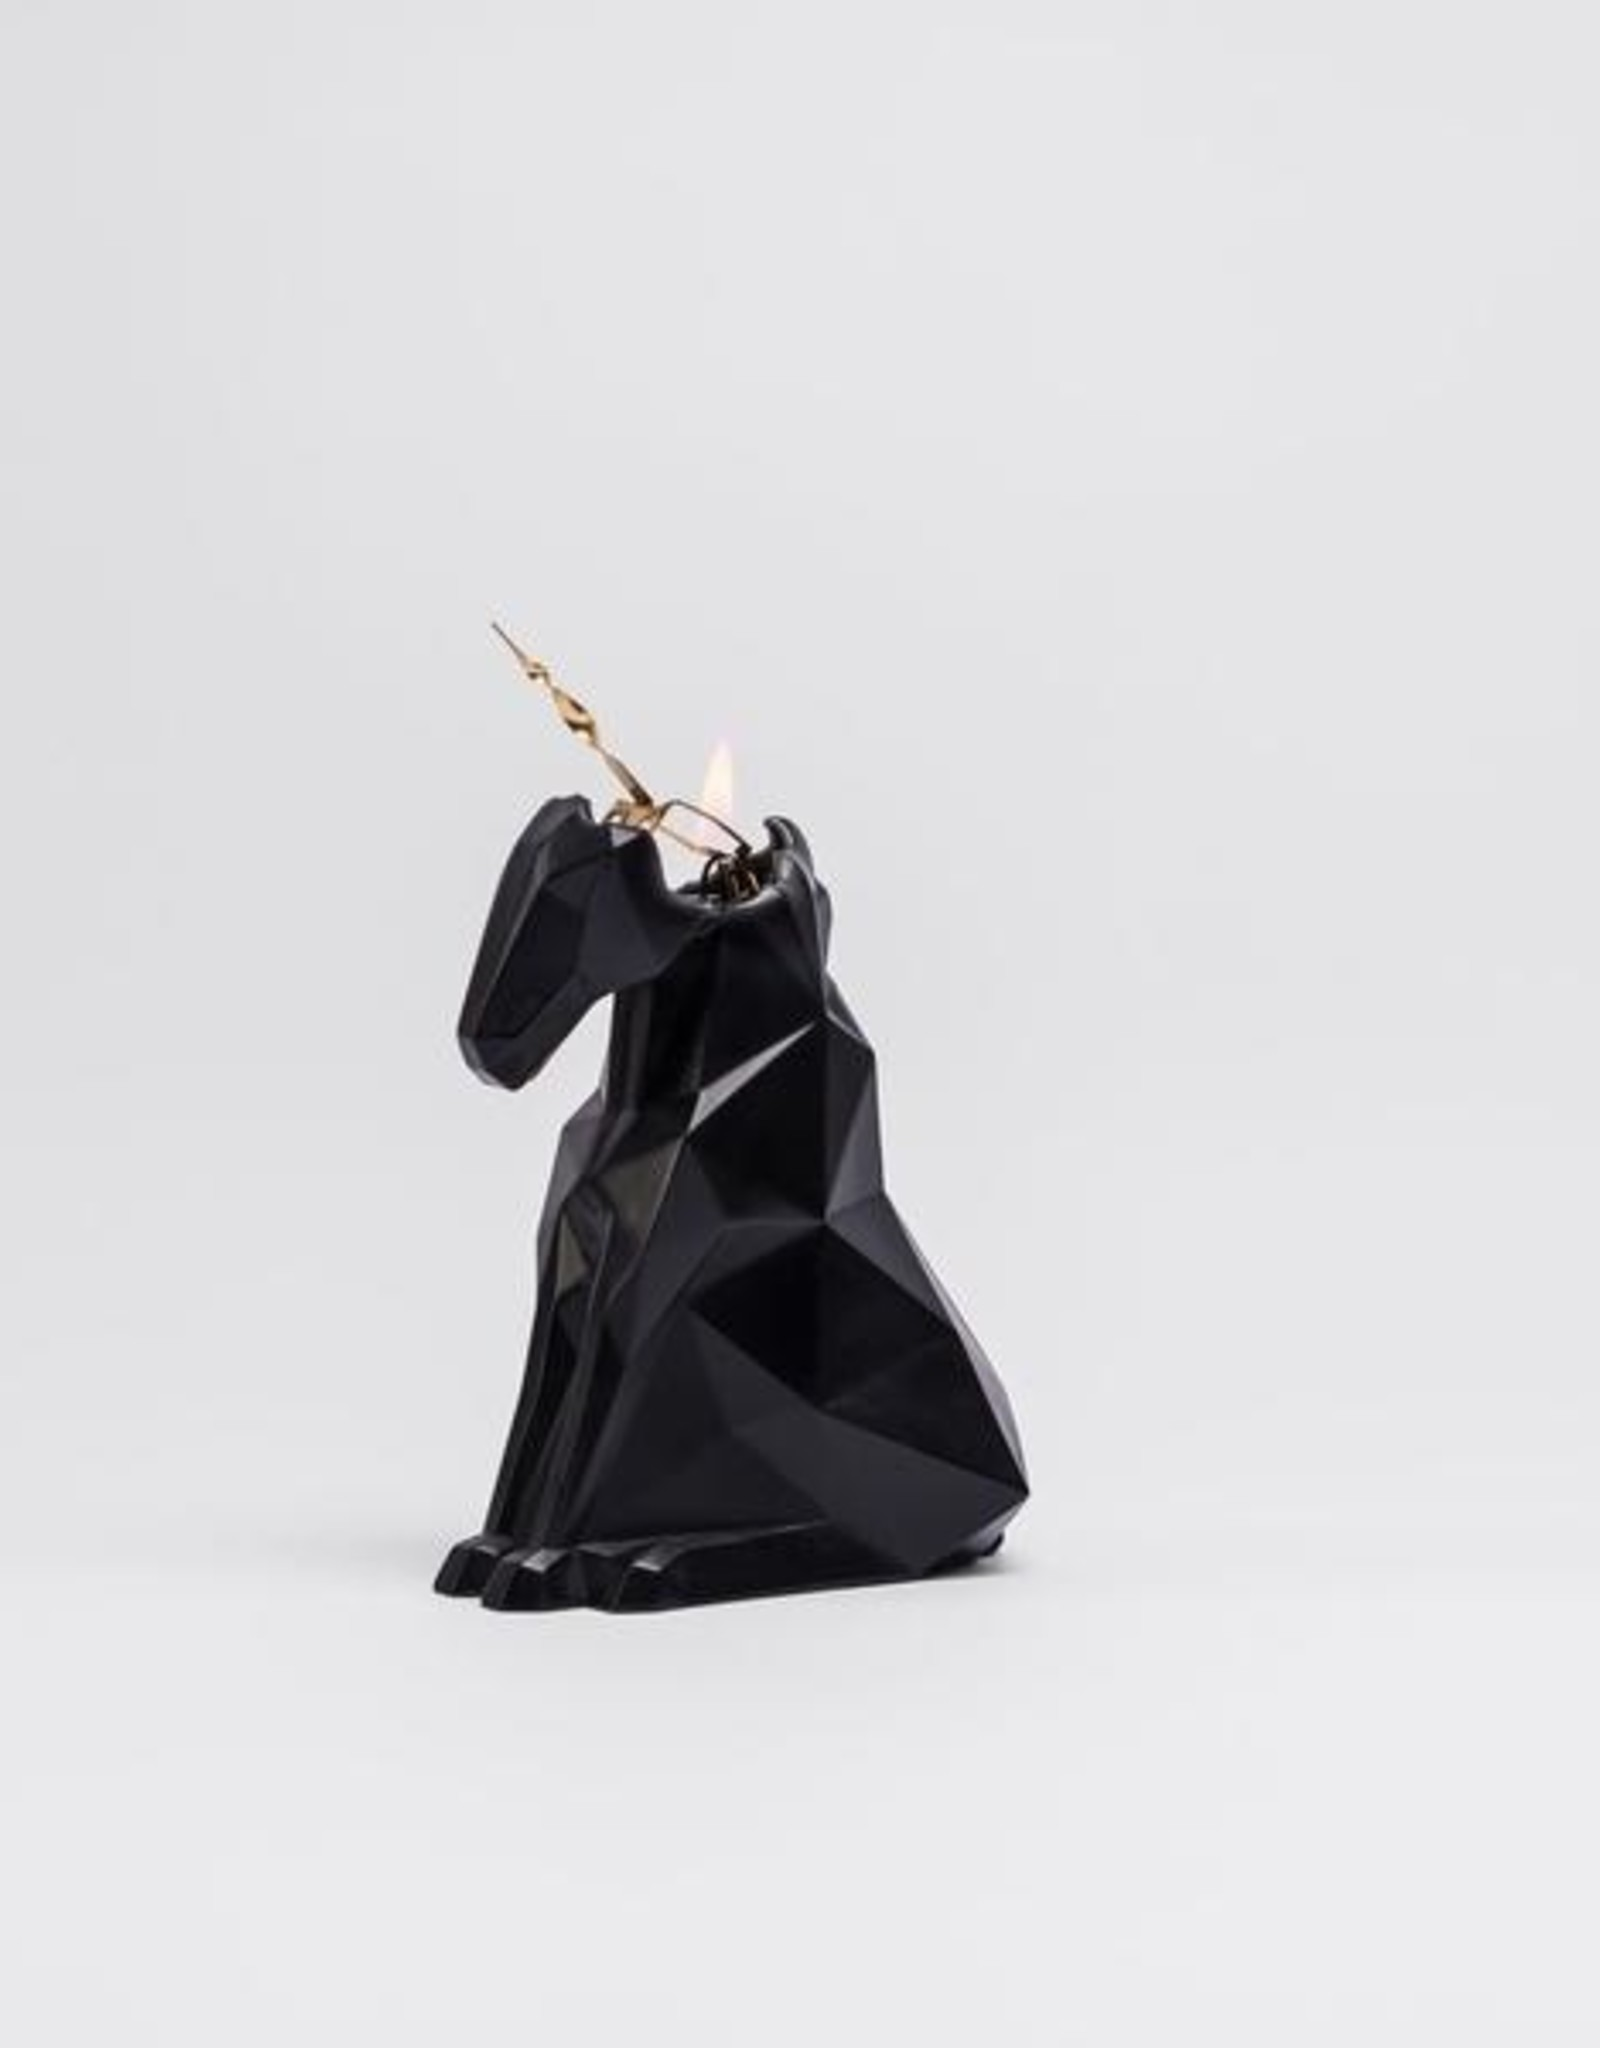 Pyropet PyroPet Einar Candle - Black